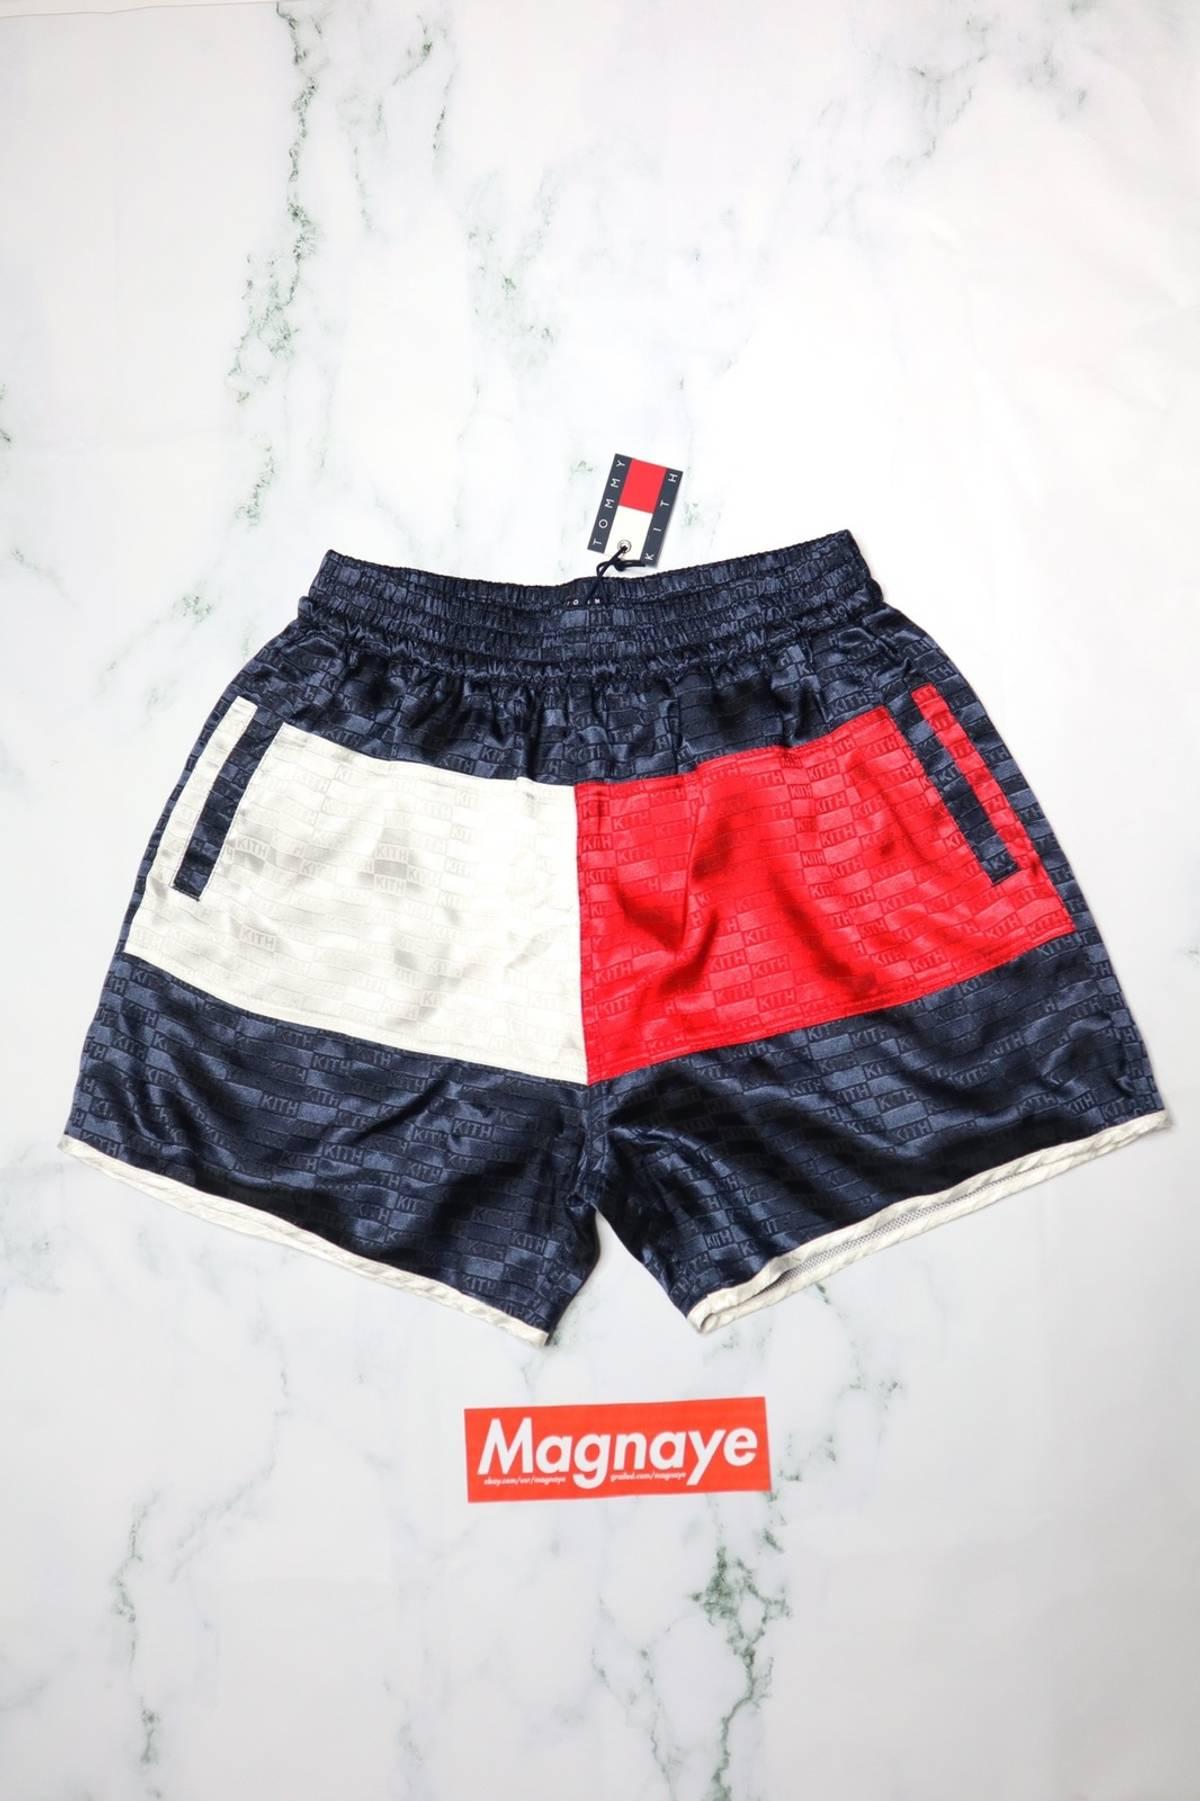 eac4da2cd7f9 Tommy Hilfiger × Kith Nyc ×. Kith x Tommy Hilfiger Satin Boxing Short ...